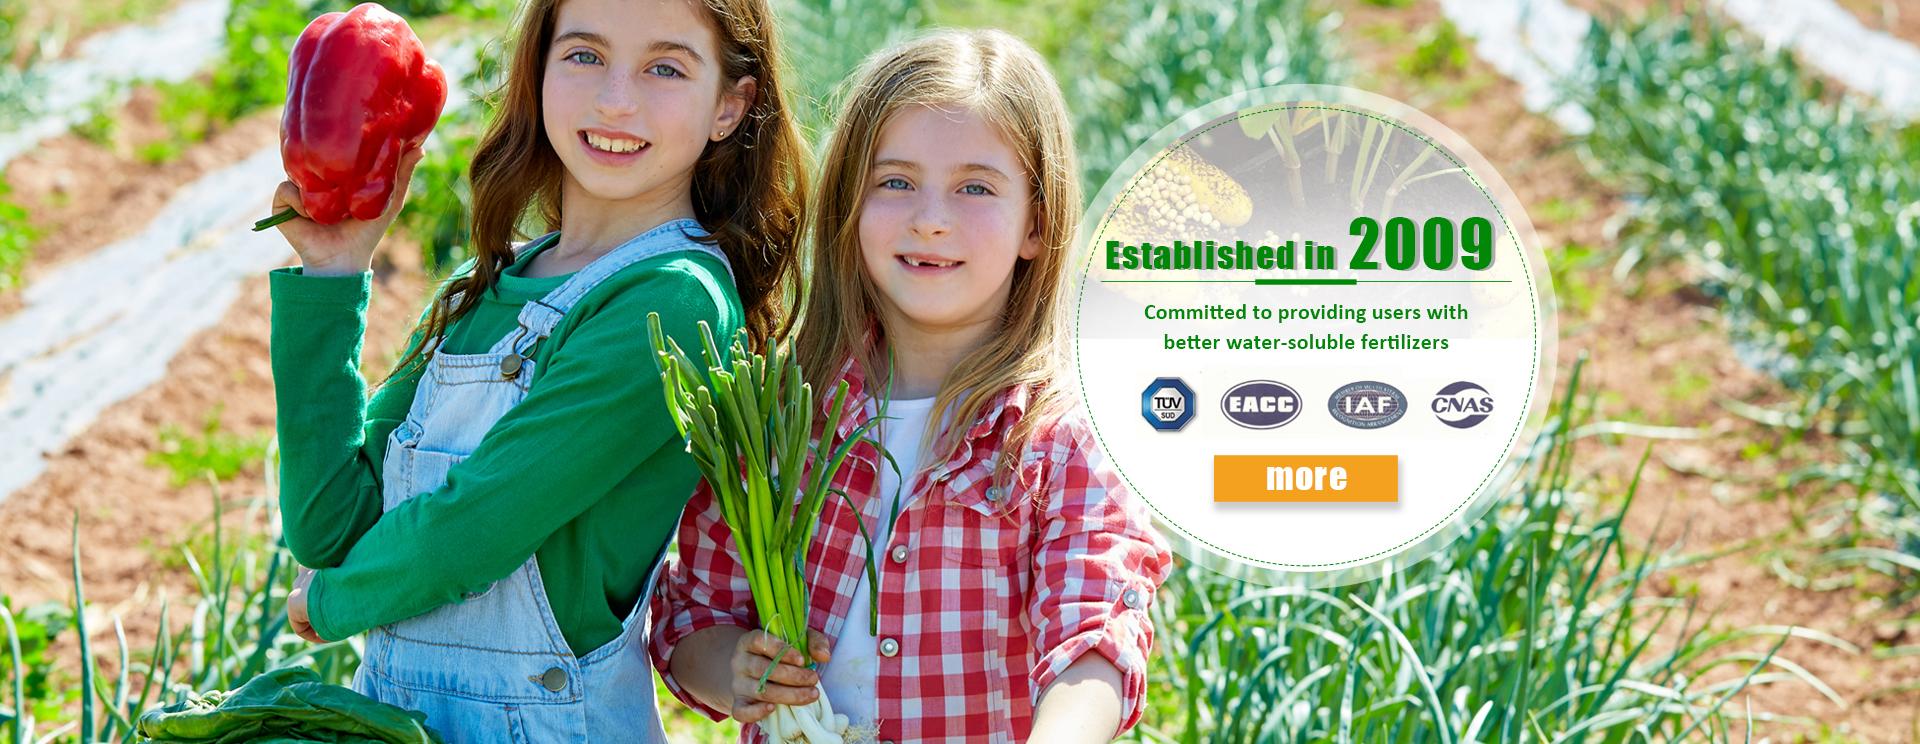 OEM 100% powder the water soluble compound npk fertilizer 20-20-20 19-19-19 18-18-18 best prices